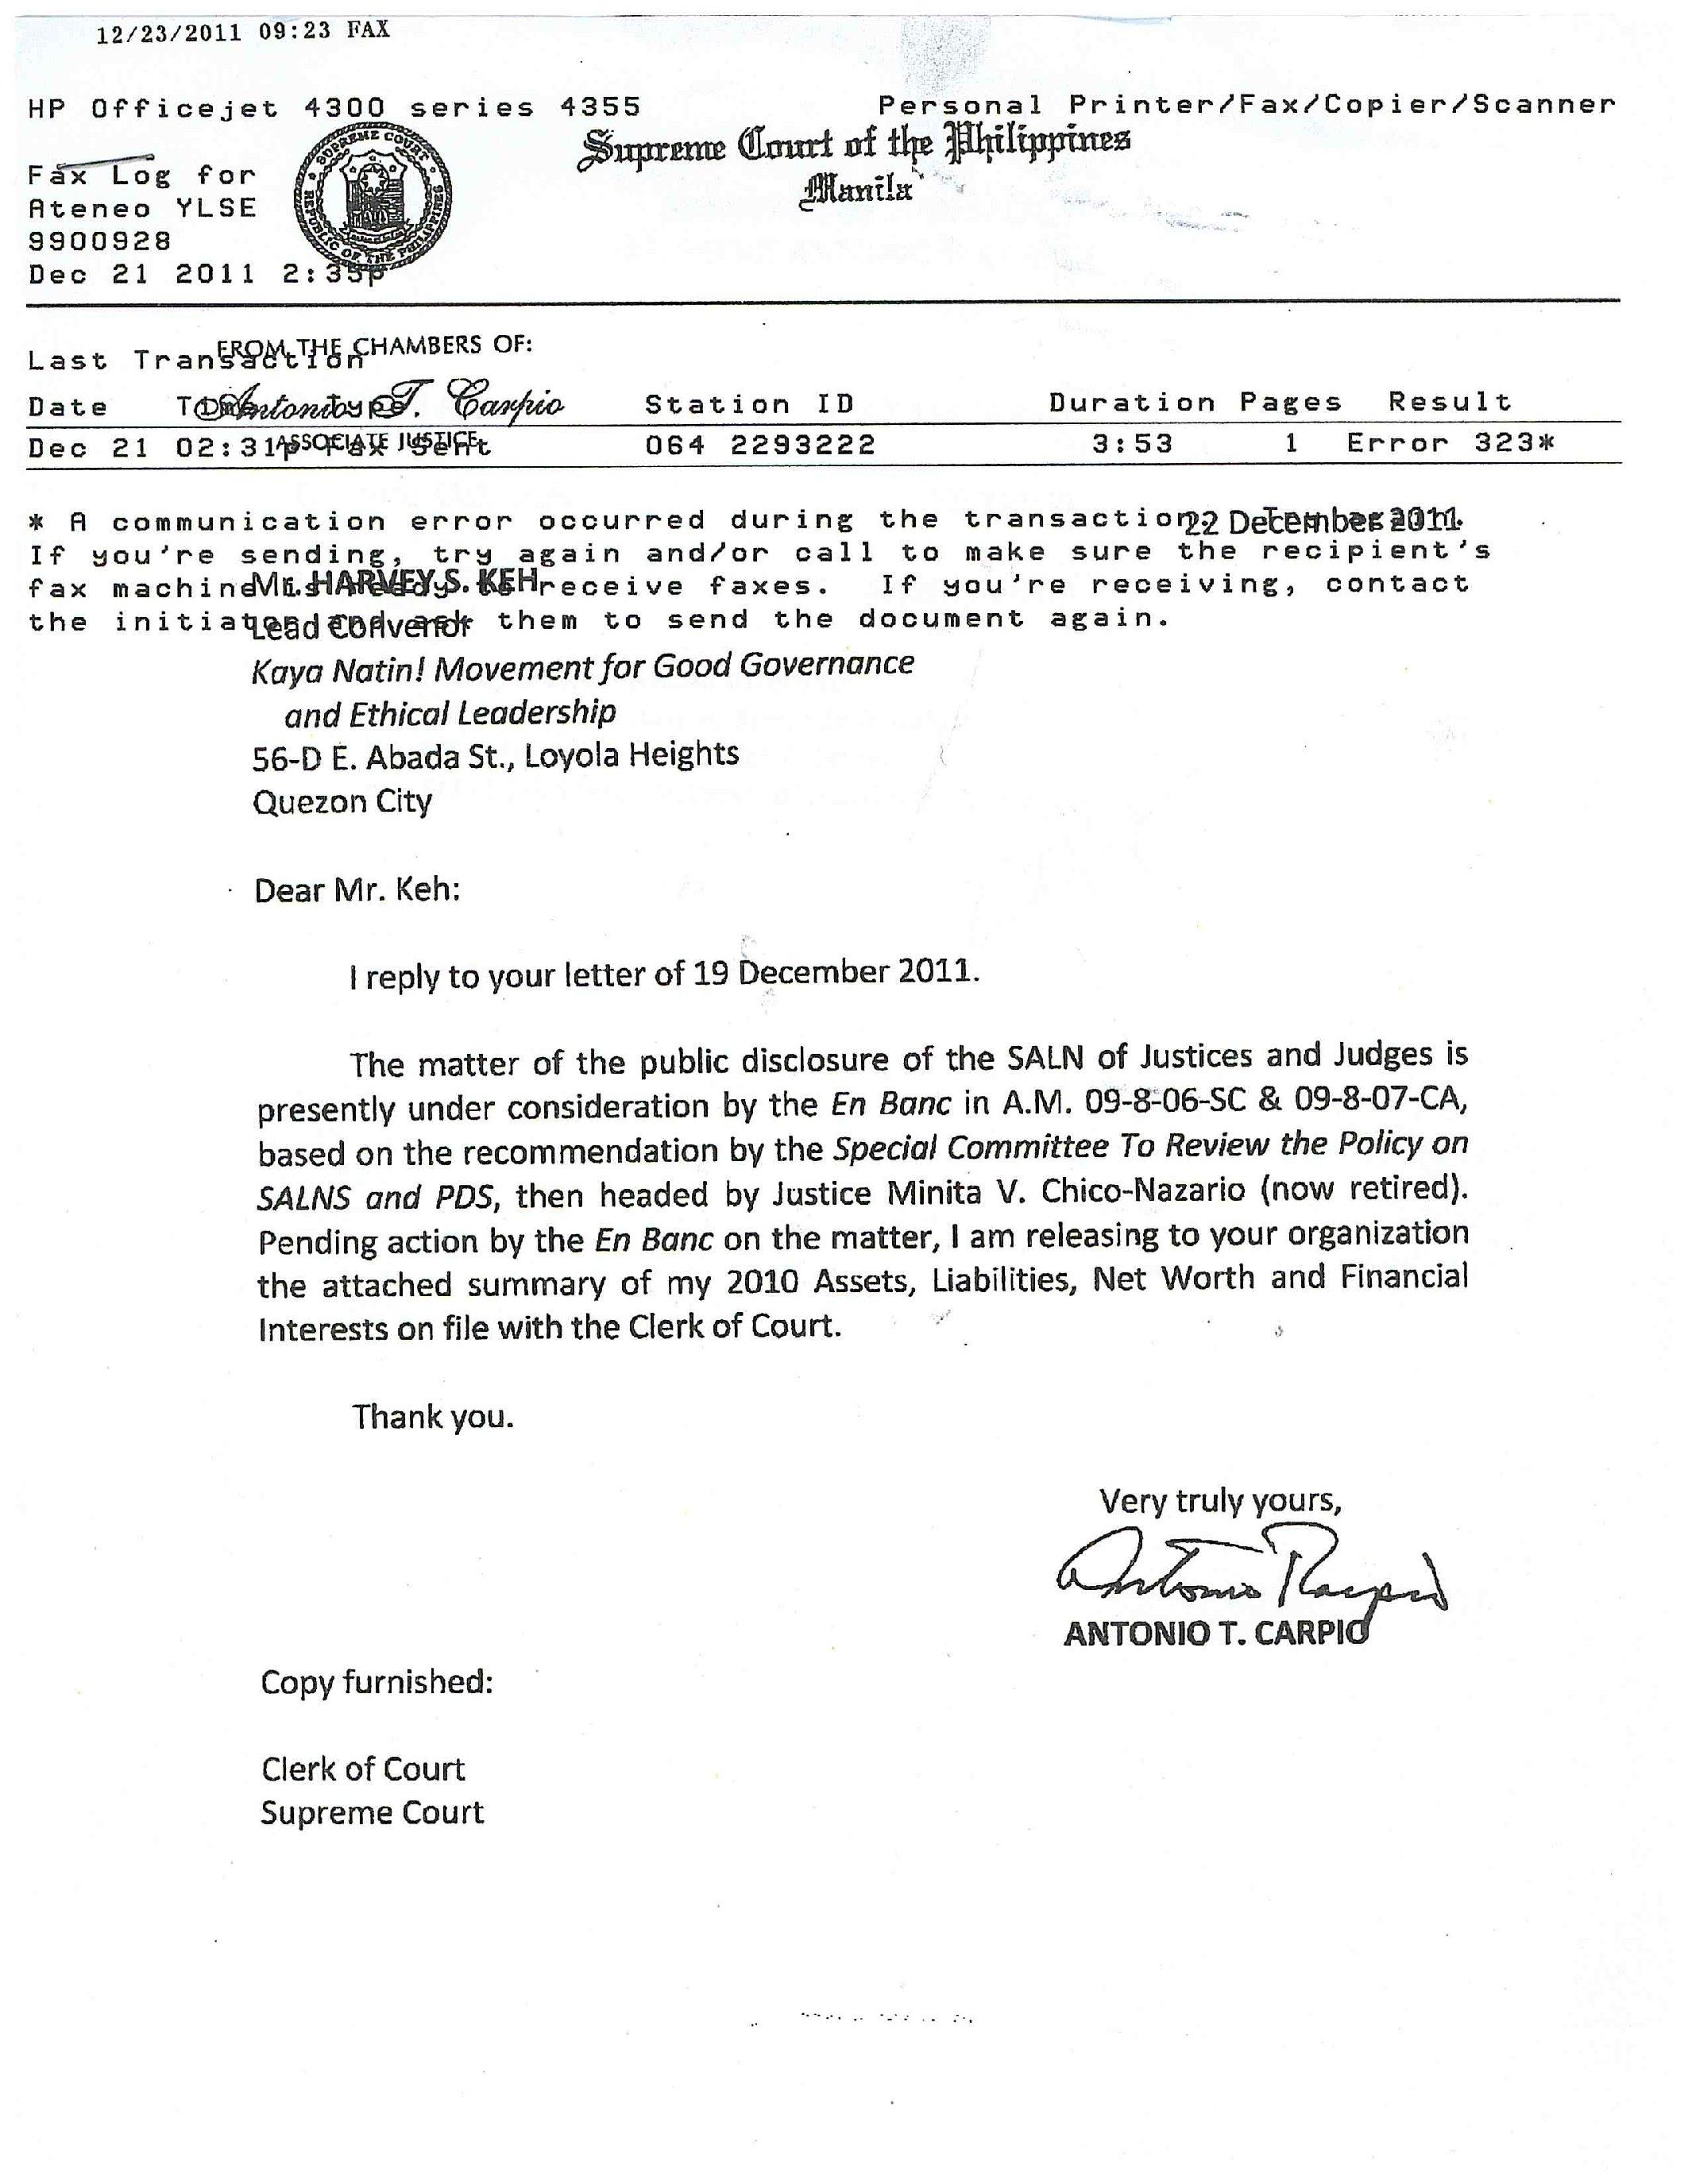 Sle fax letter 28 images business letter format via fax business business letter format via fax business letter format spiritdancerdesigns Image collections